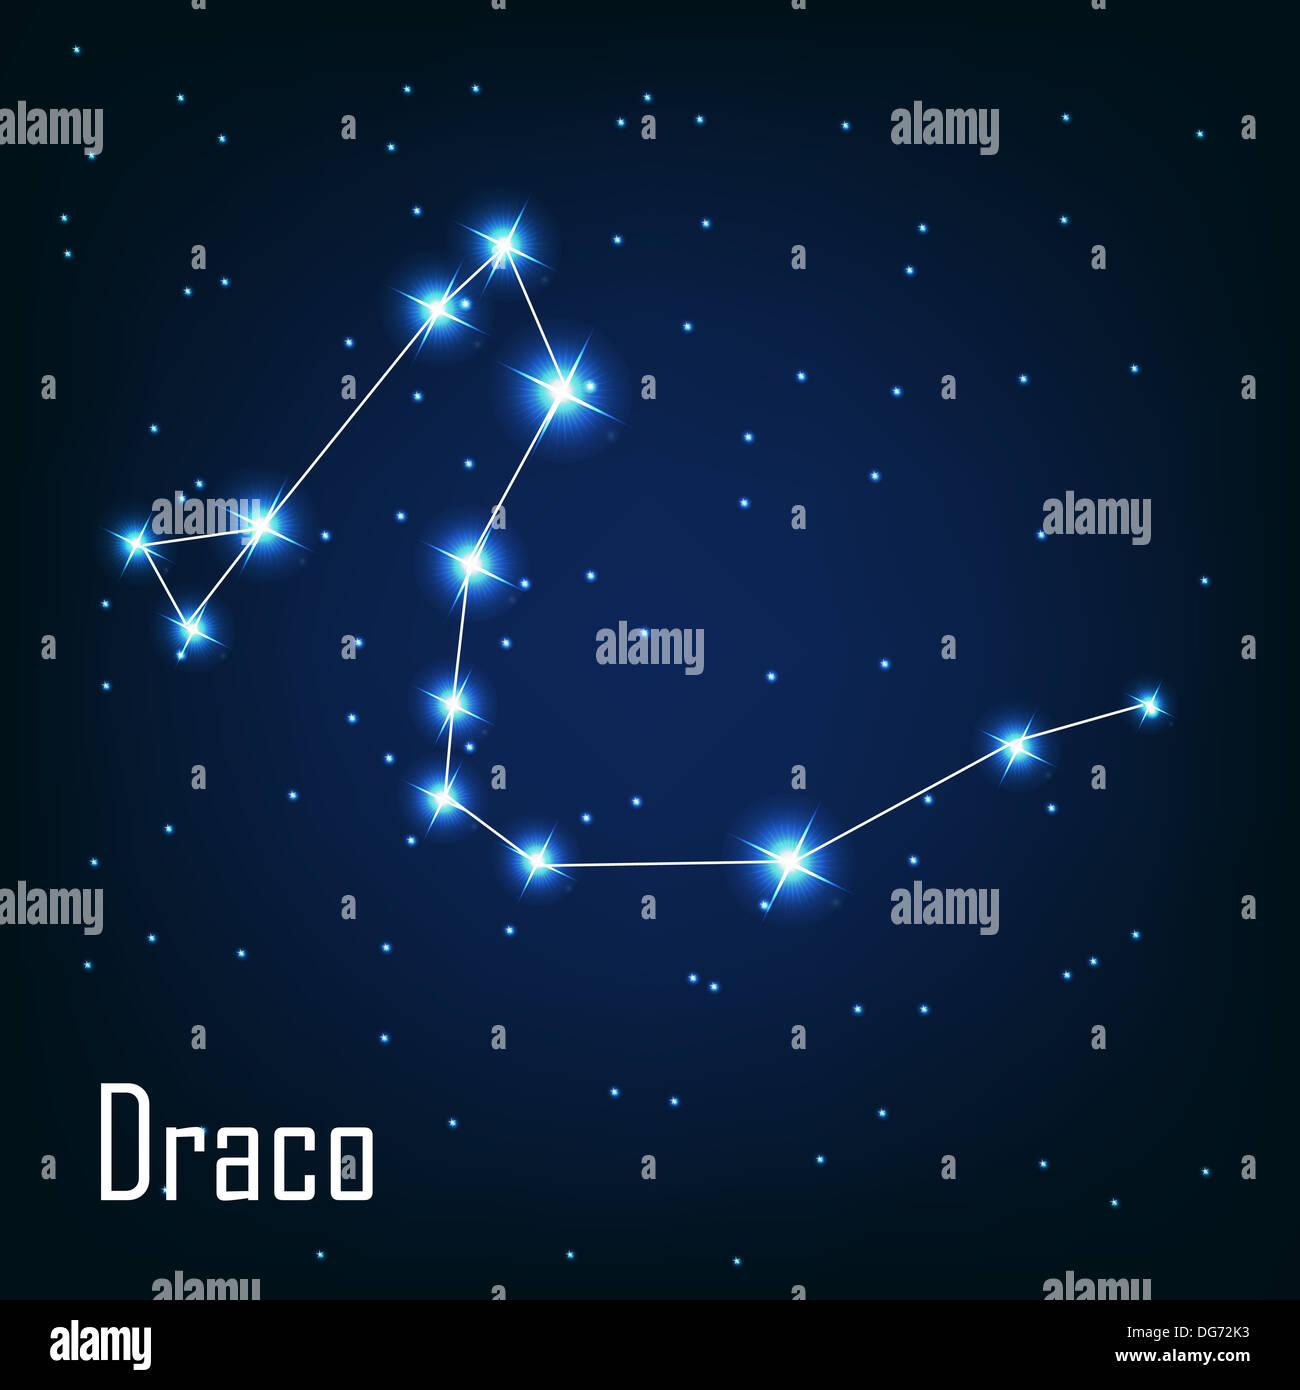 The constellation ' Draco' star in the night sky. Vector illustr - Stock Image